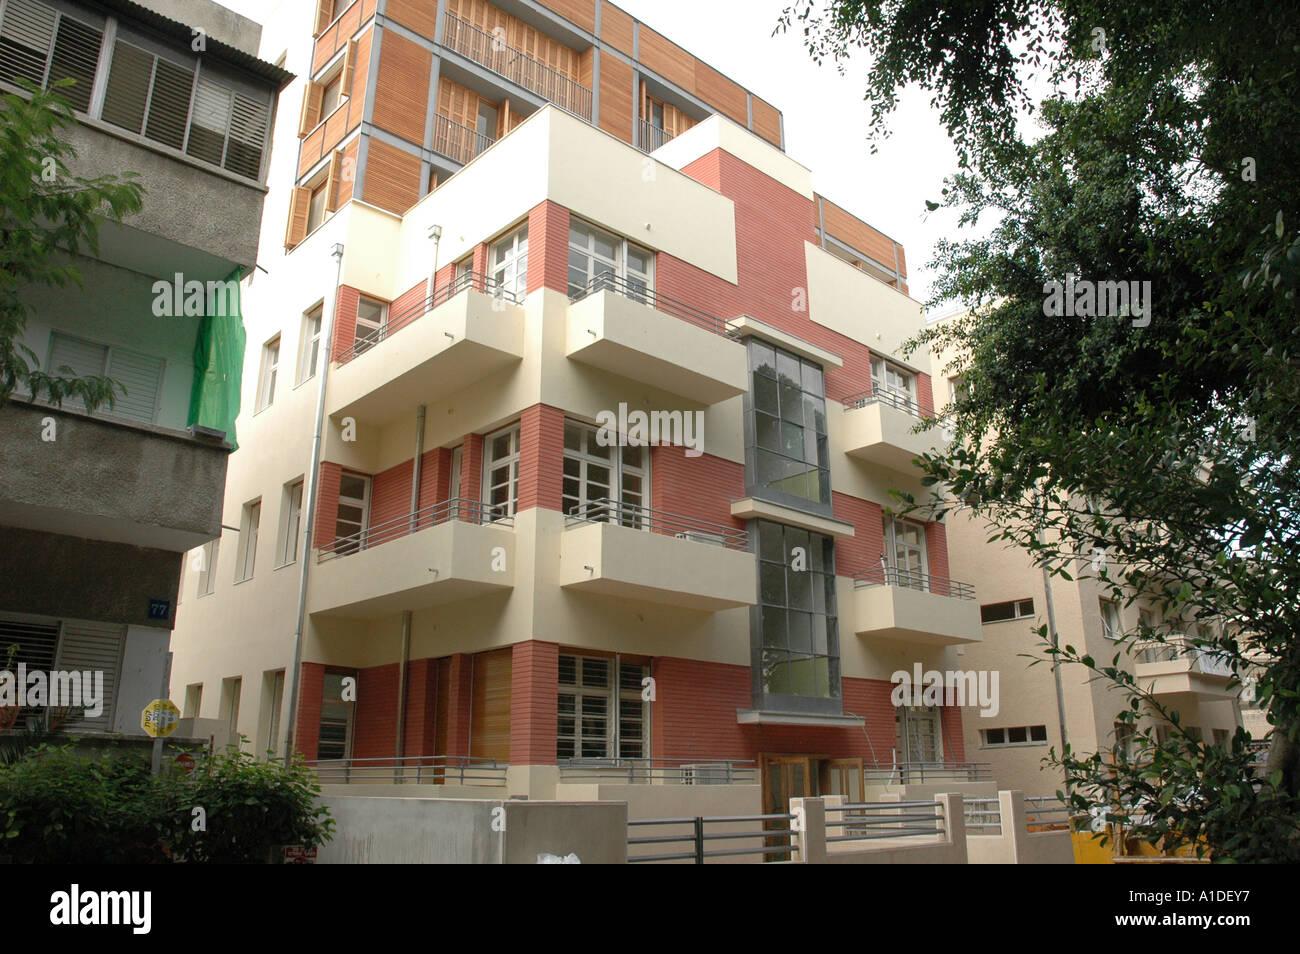 Old Bauhaus style building in Rothschild Boulevard Tel Aviv Israel - Stock Image